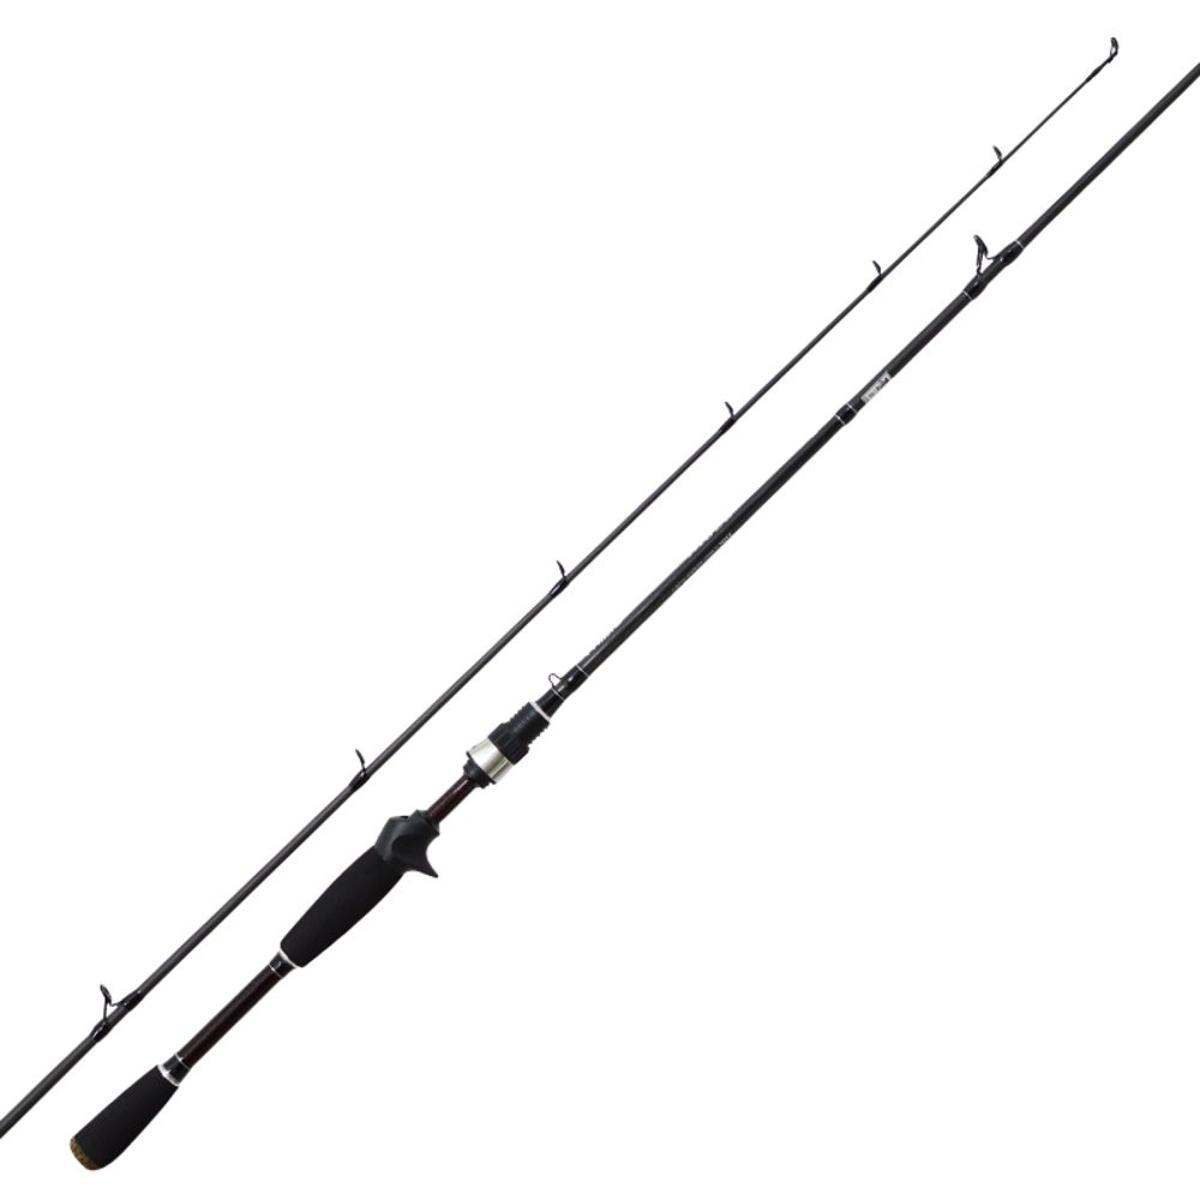 Vara Lumis Viper 802 (2,40m) 15-40lb Carretilha 2 Partes  - Pesca Adventure